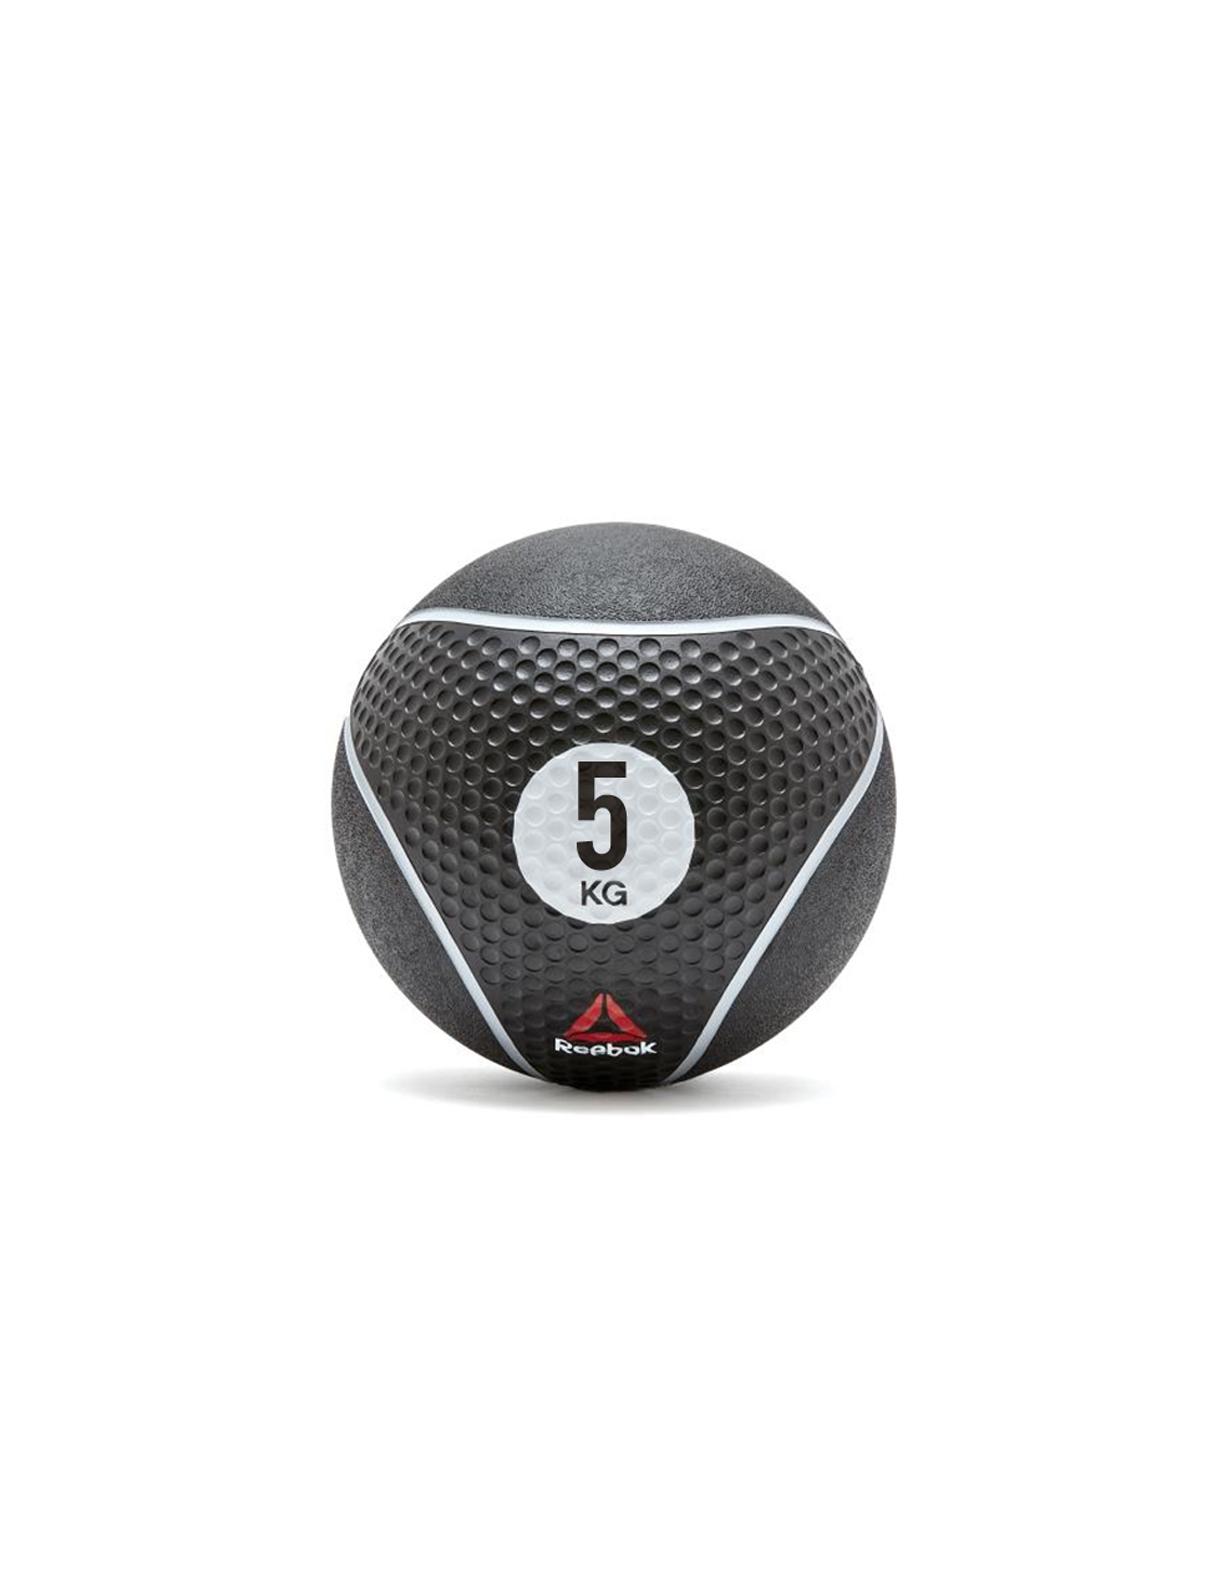 RSB-16055 Medicine Ball - 5Kg